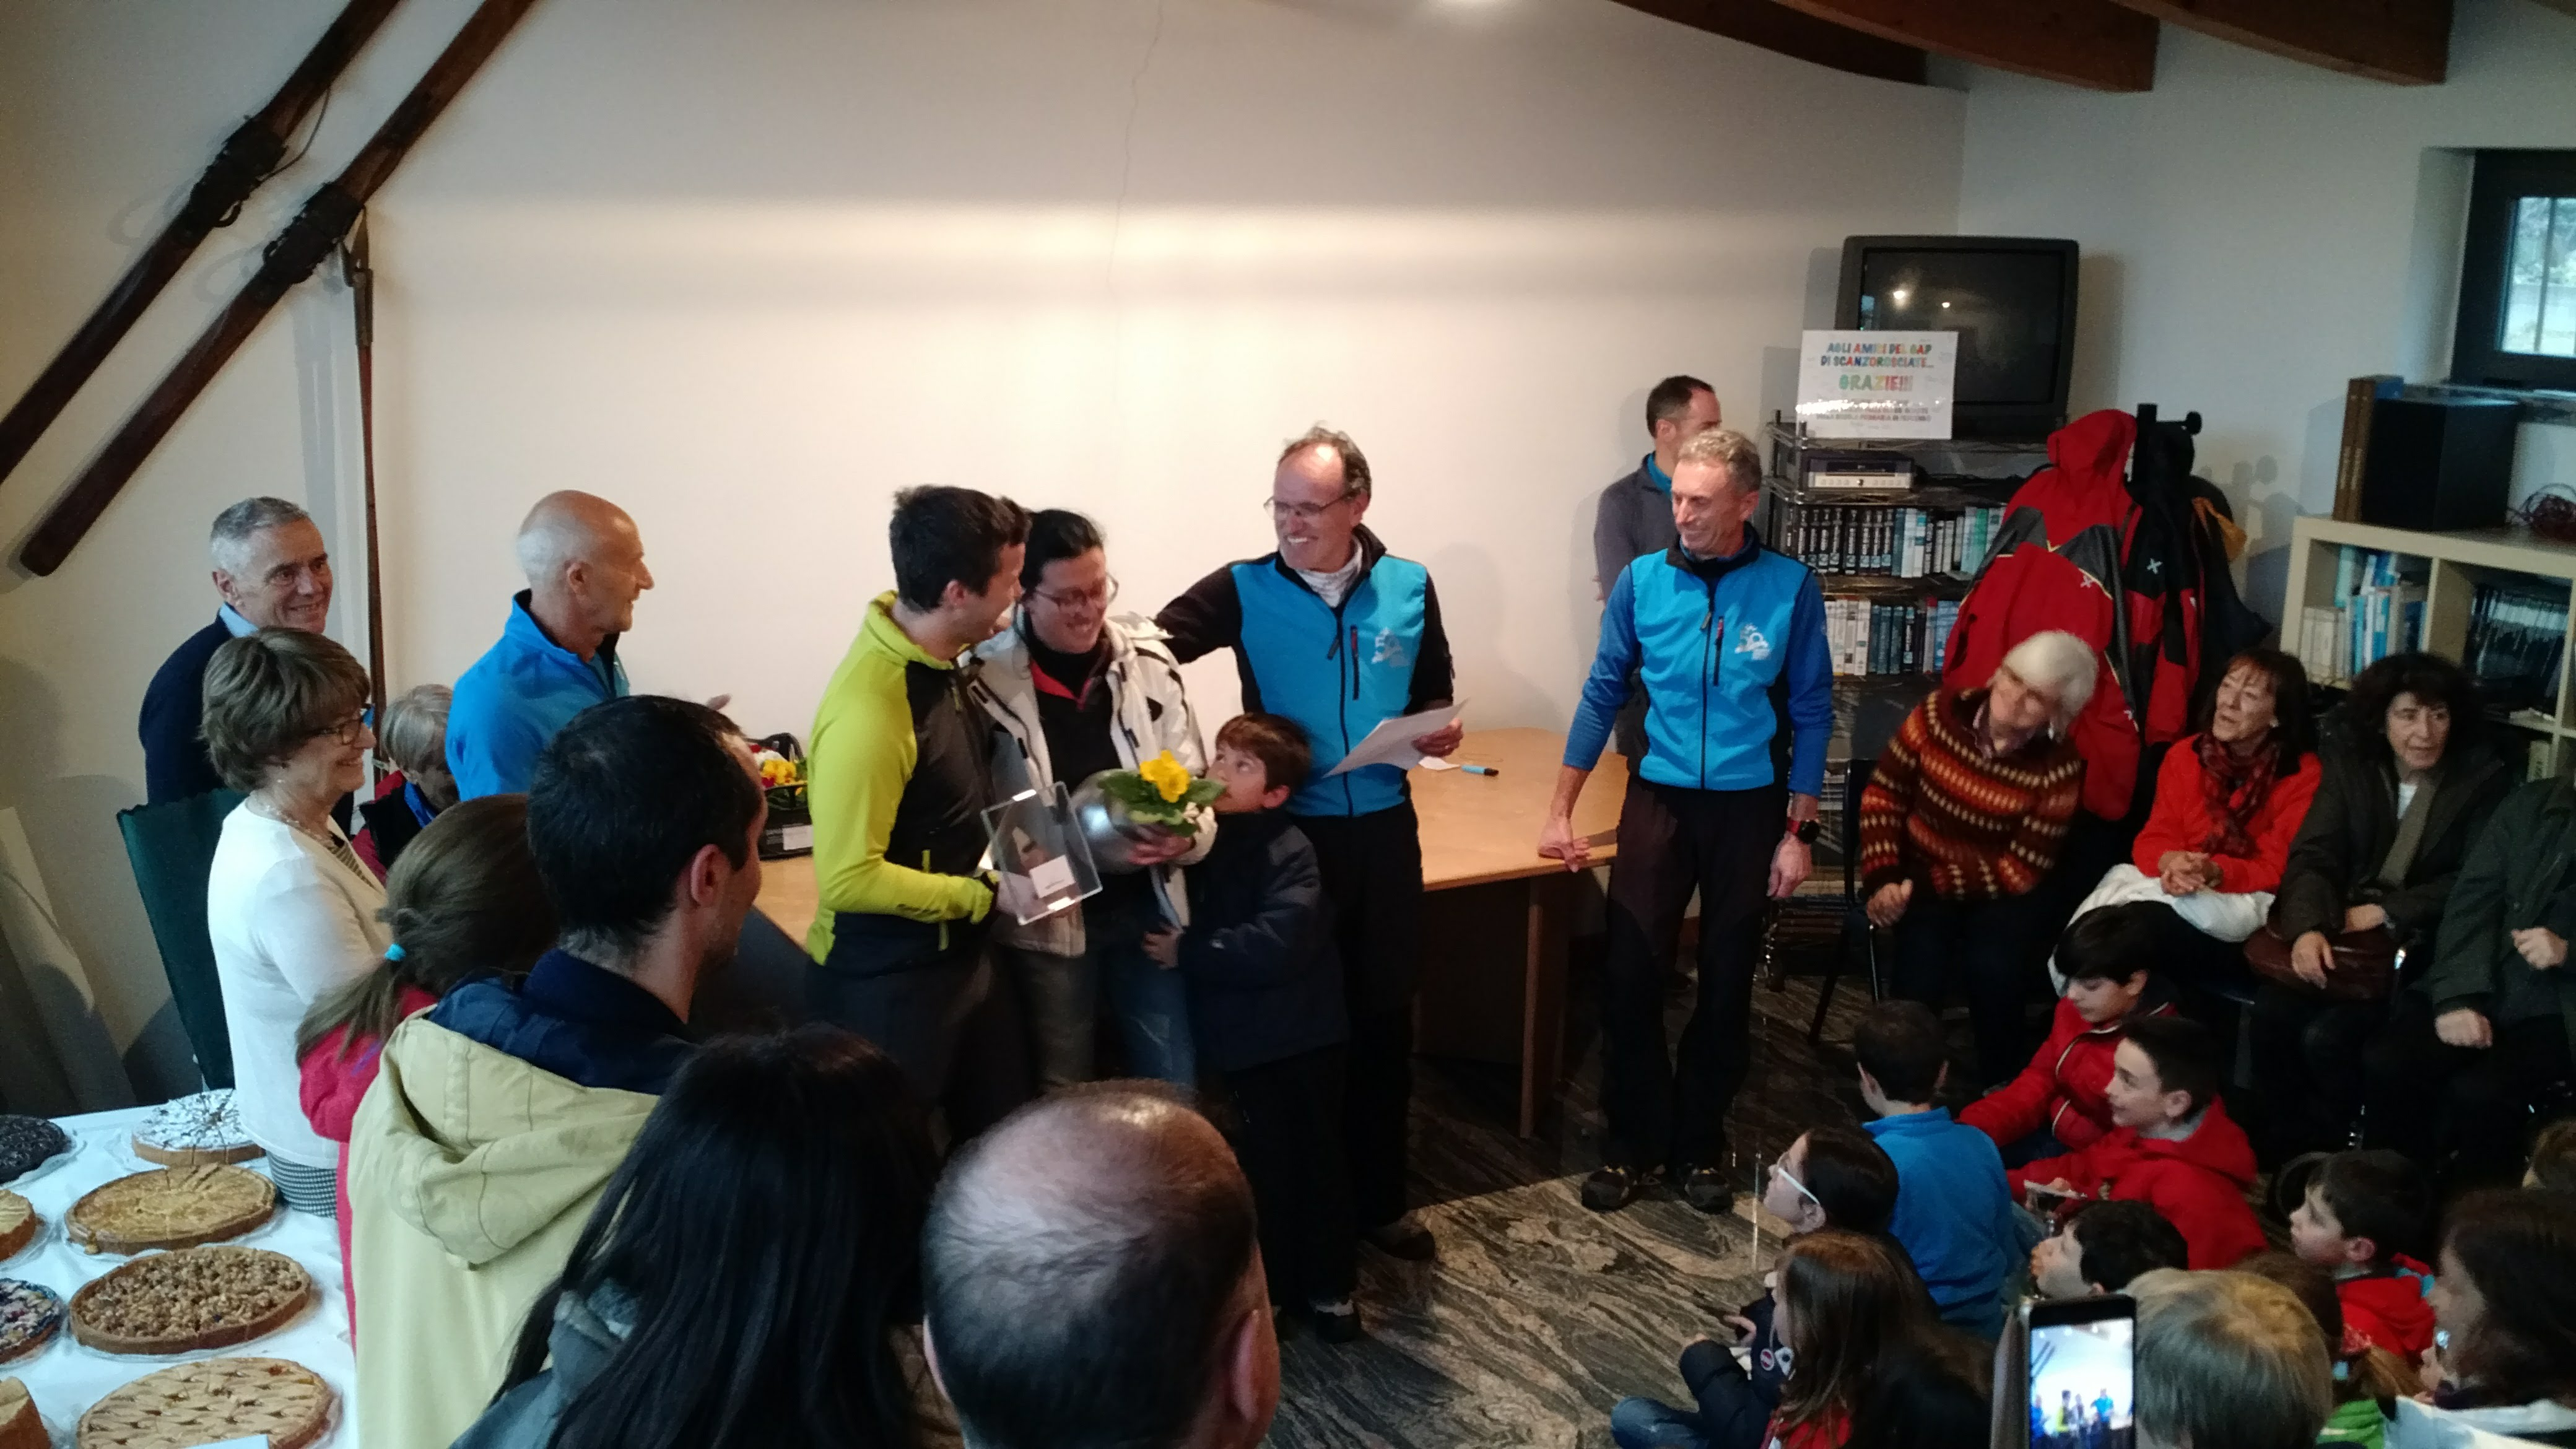 Marco ed Elena vincitori del Trofeo Benigni